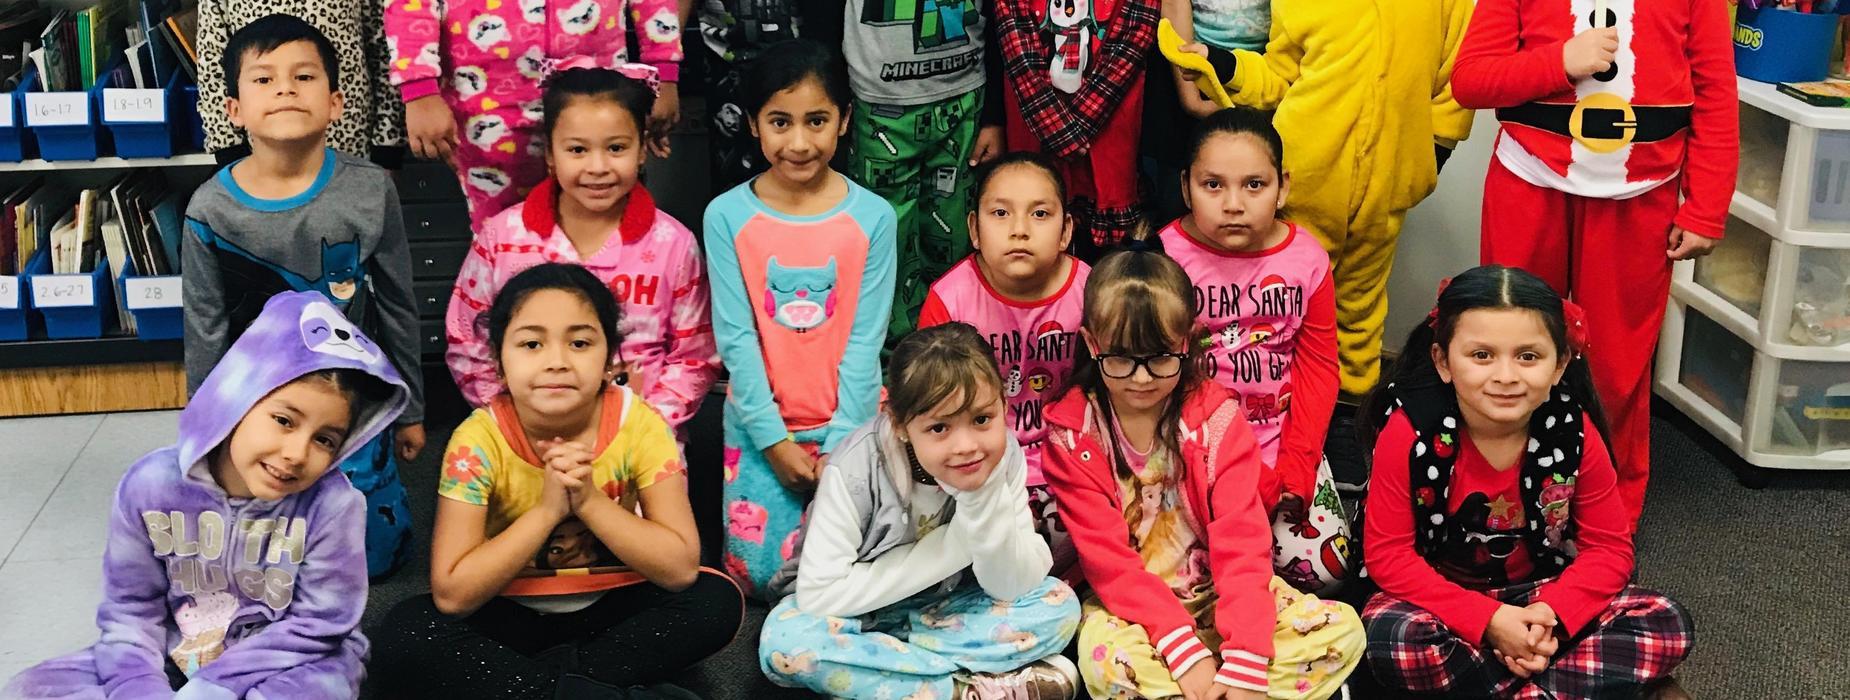 students wearing pajamas